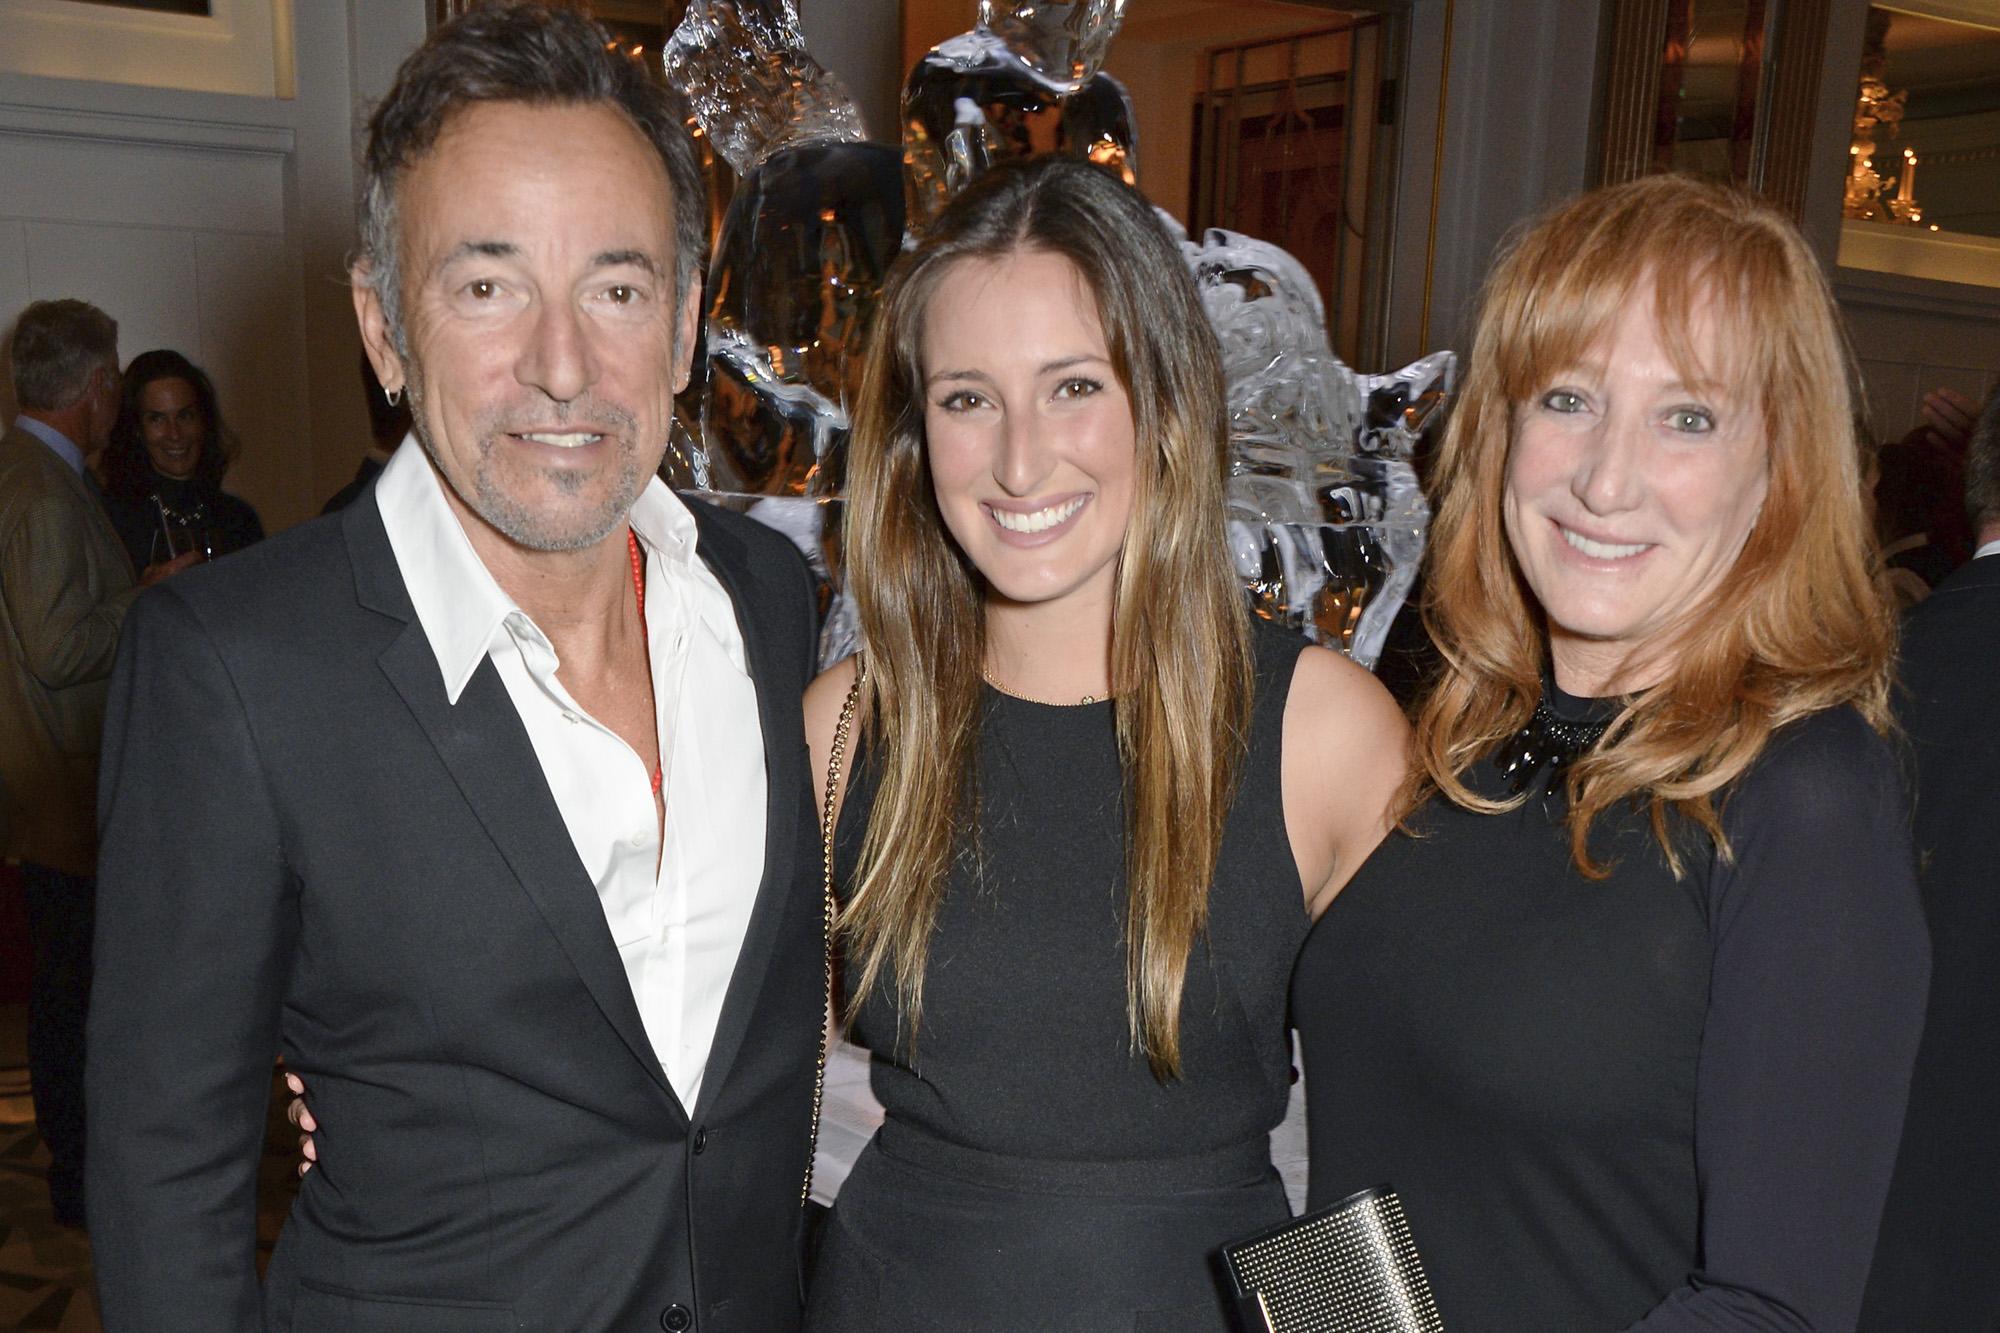 Bruce Springsteen, Jessica Springsteen, Patti Scialfa